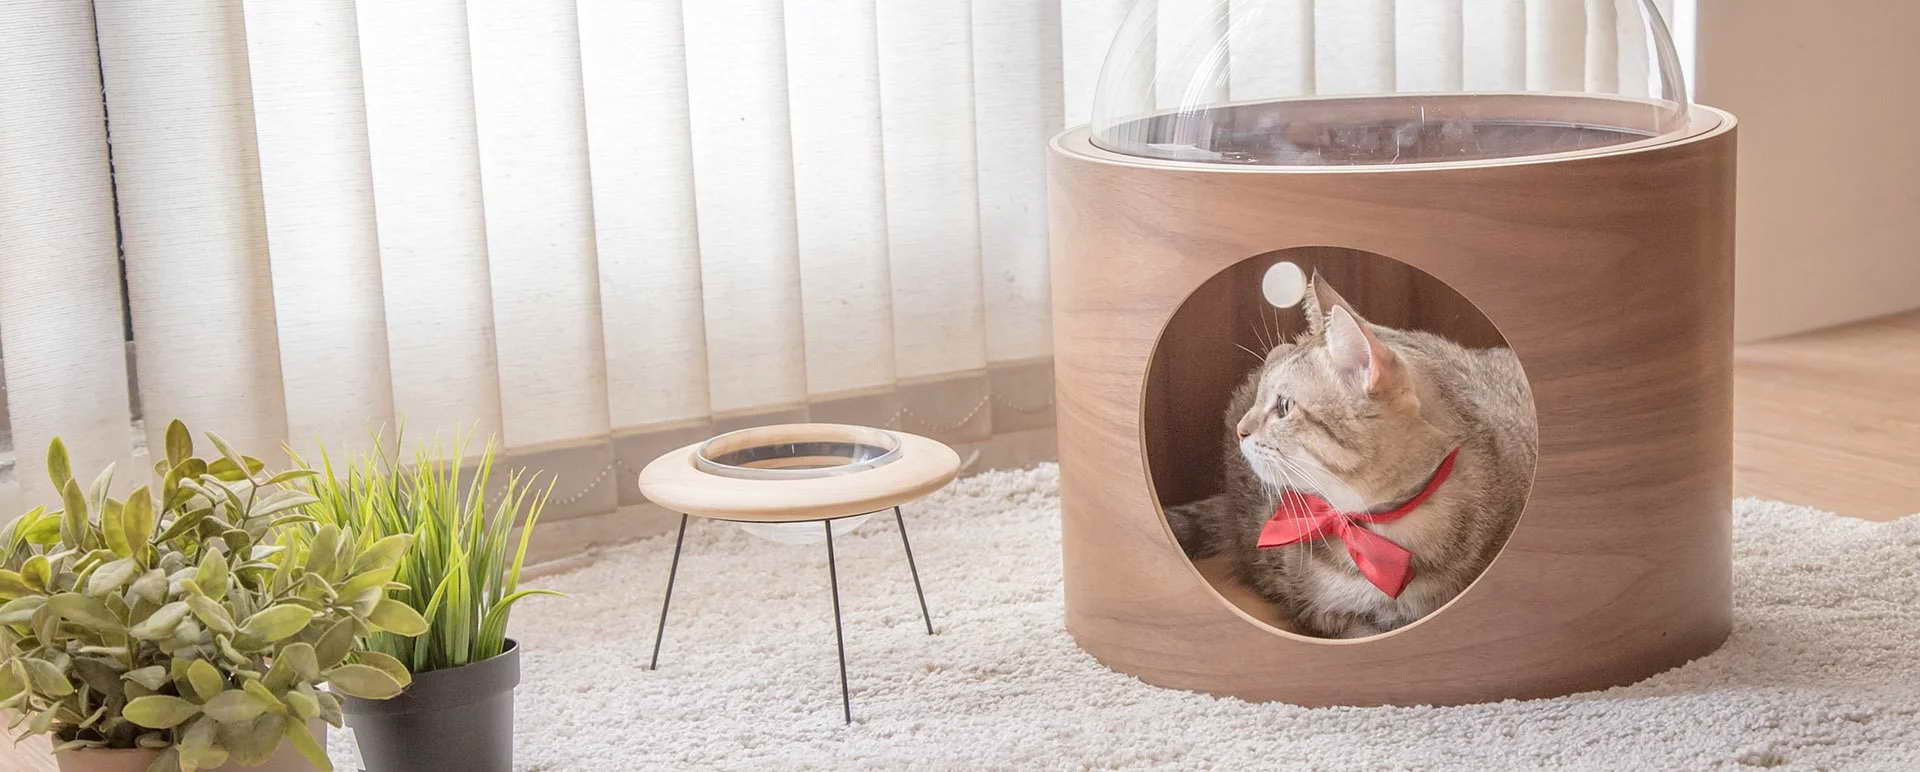 design macska ház - cica ház a földre